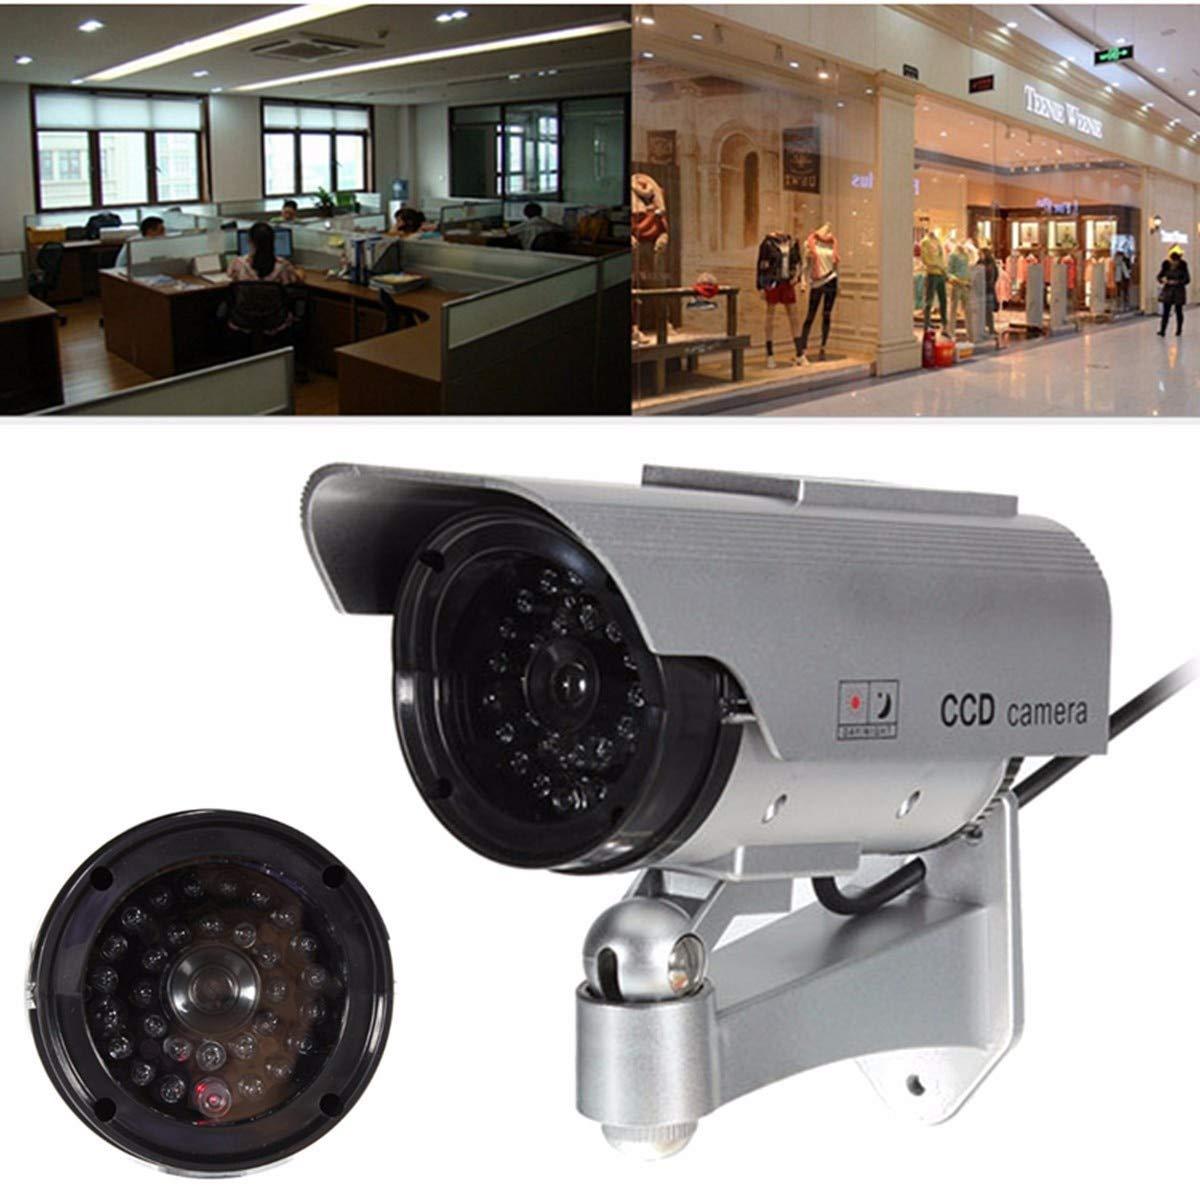 DELAMZ - Simulation Camera Solar Power Dummy Camera Outdoor CCTV Surveillance Camera With LED Light by DELAMZ